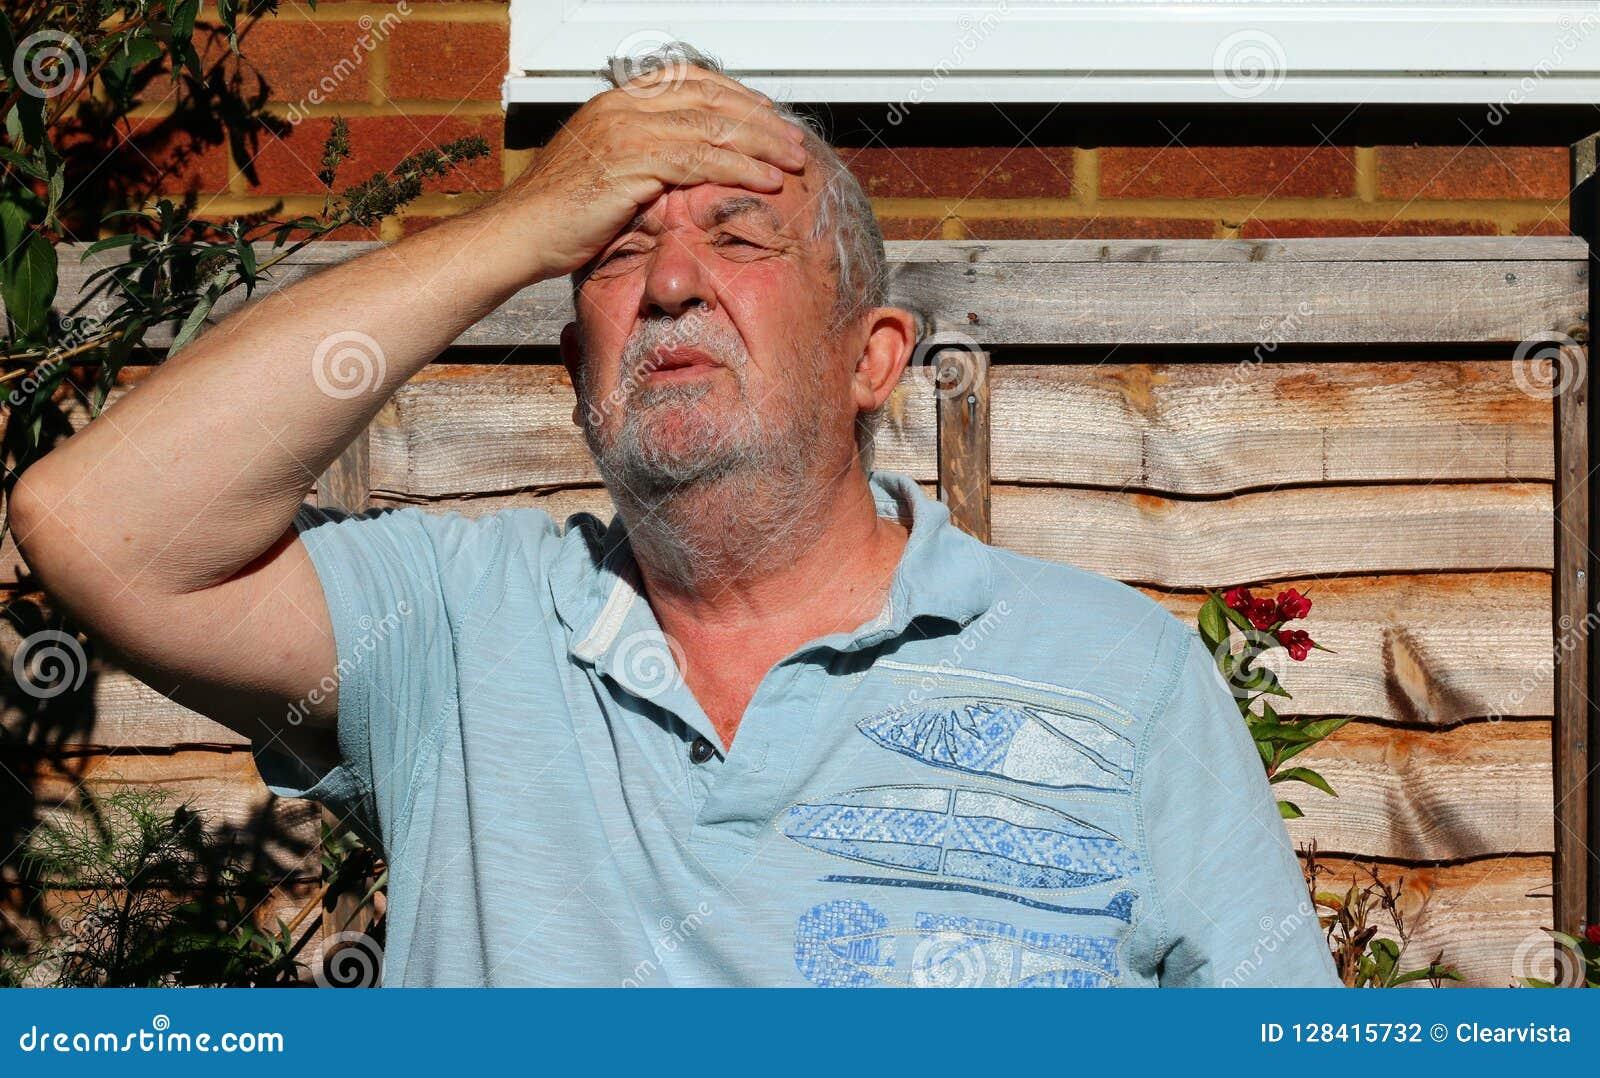 Headache or migraine. Man holding his head in pain.